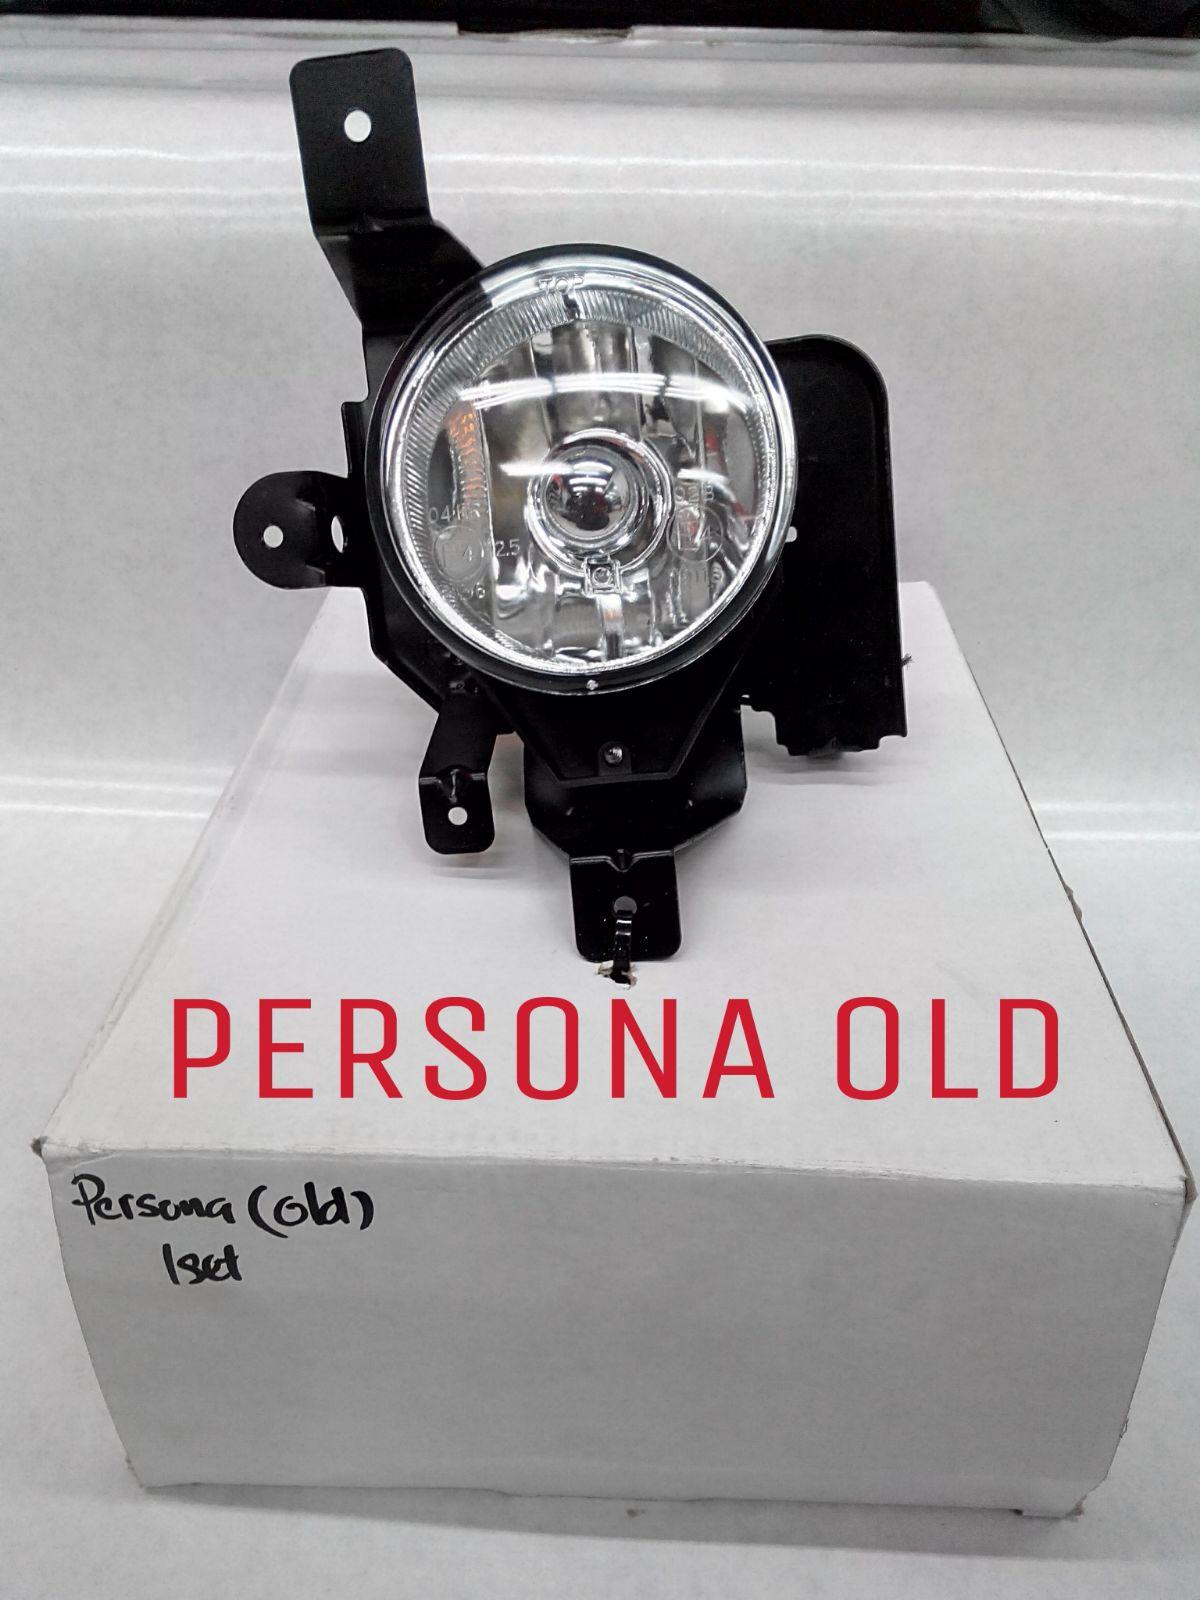 Persona Old Fog Lamp Shah Alam Car Accessories Triton Complete